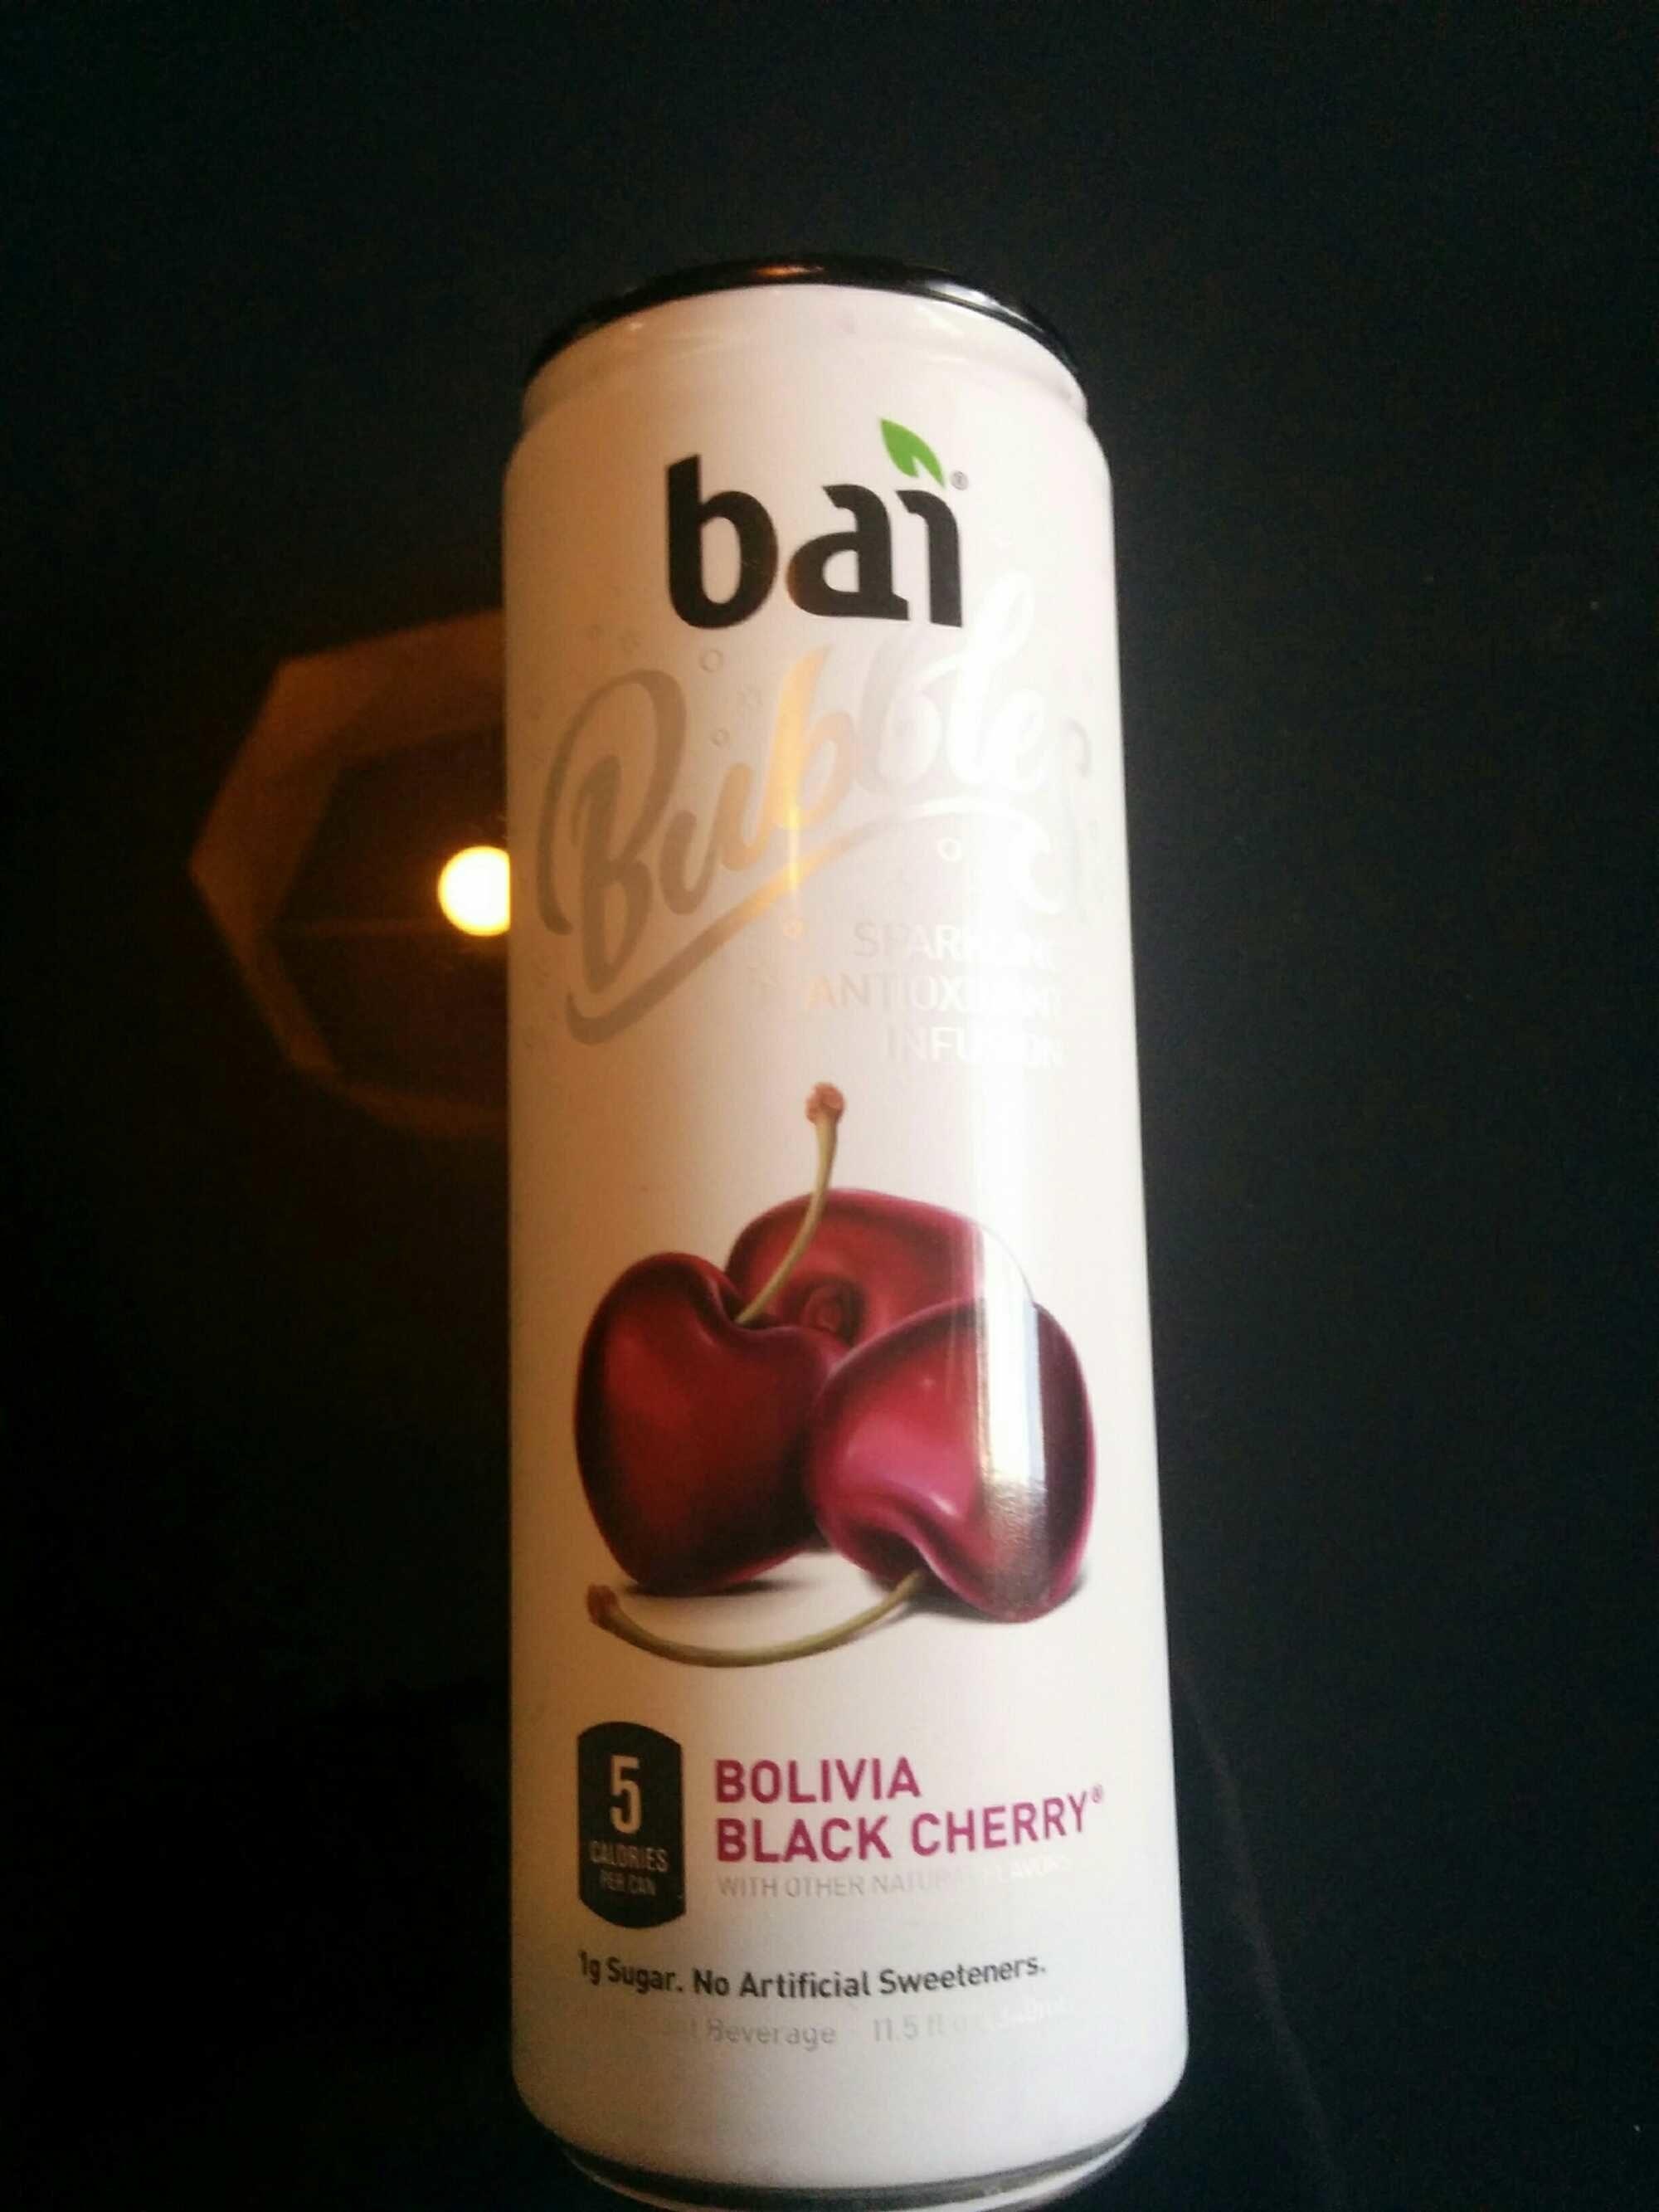 Bubbles Sparkling Antioxidant Infusion, Antioxidant Beverage, Bolivia Black Cherry - Product